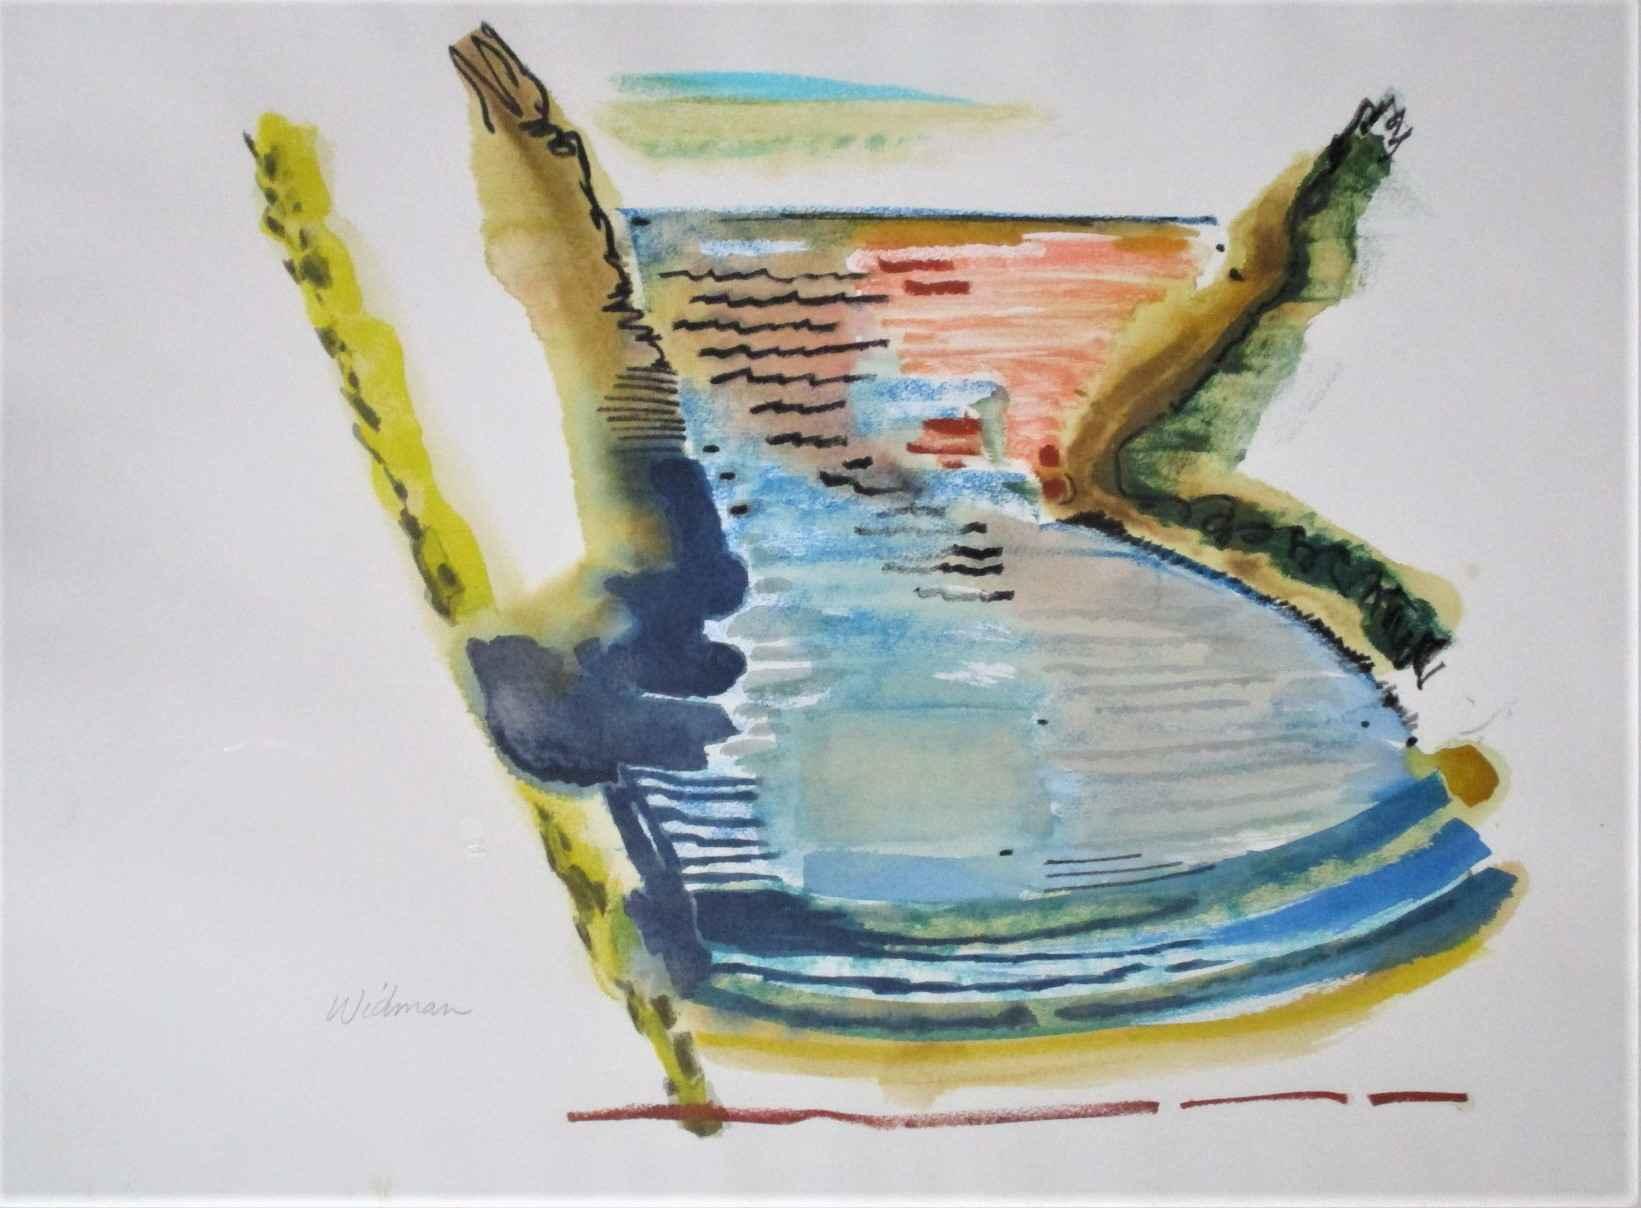 Unknown (Inlet) by  Harry Widman - Masterpiece Online